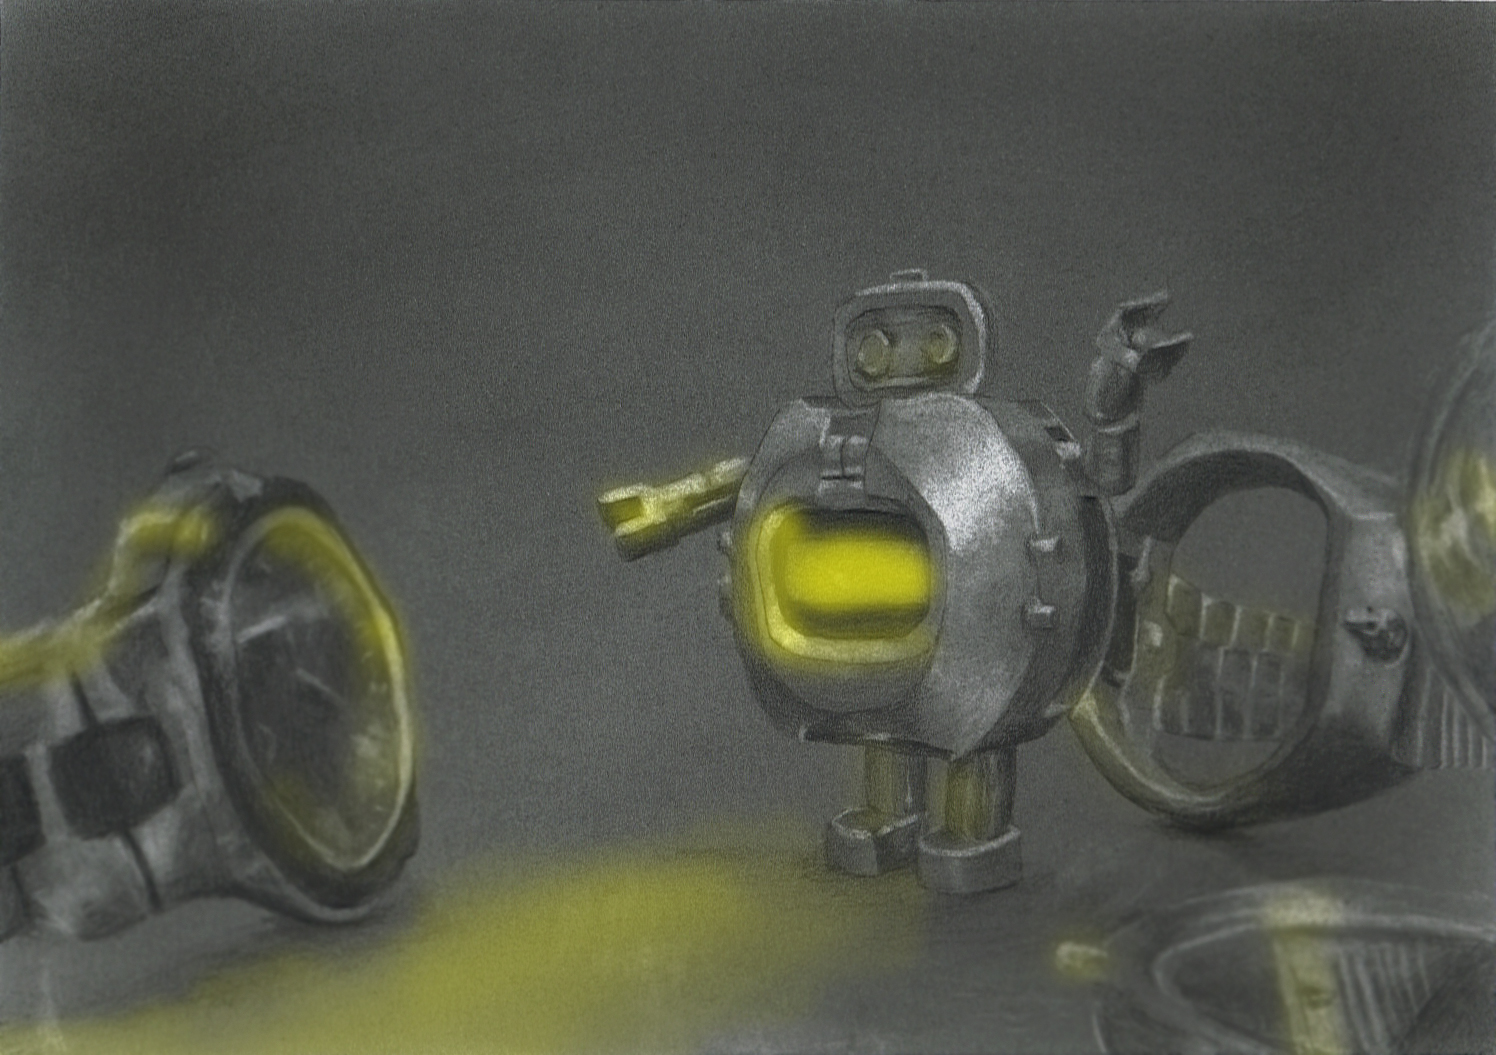 Watch-bot